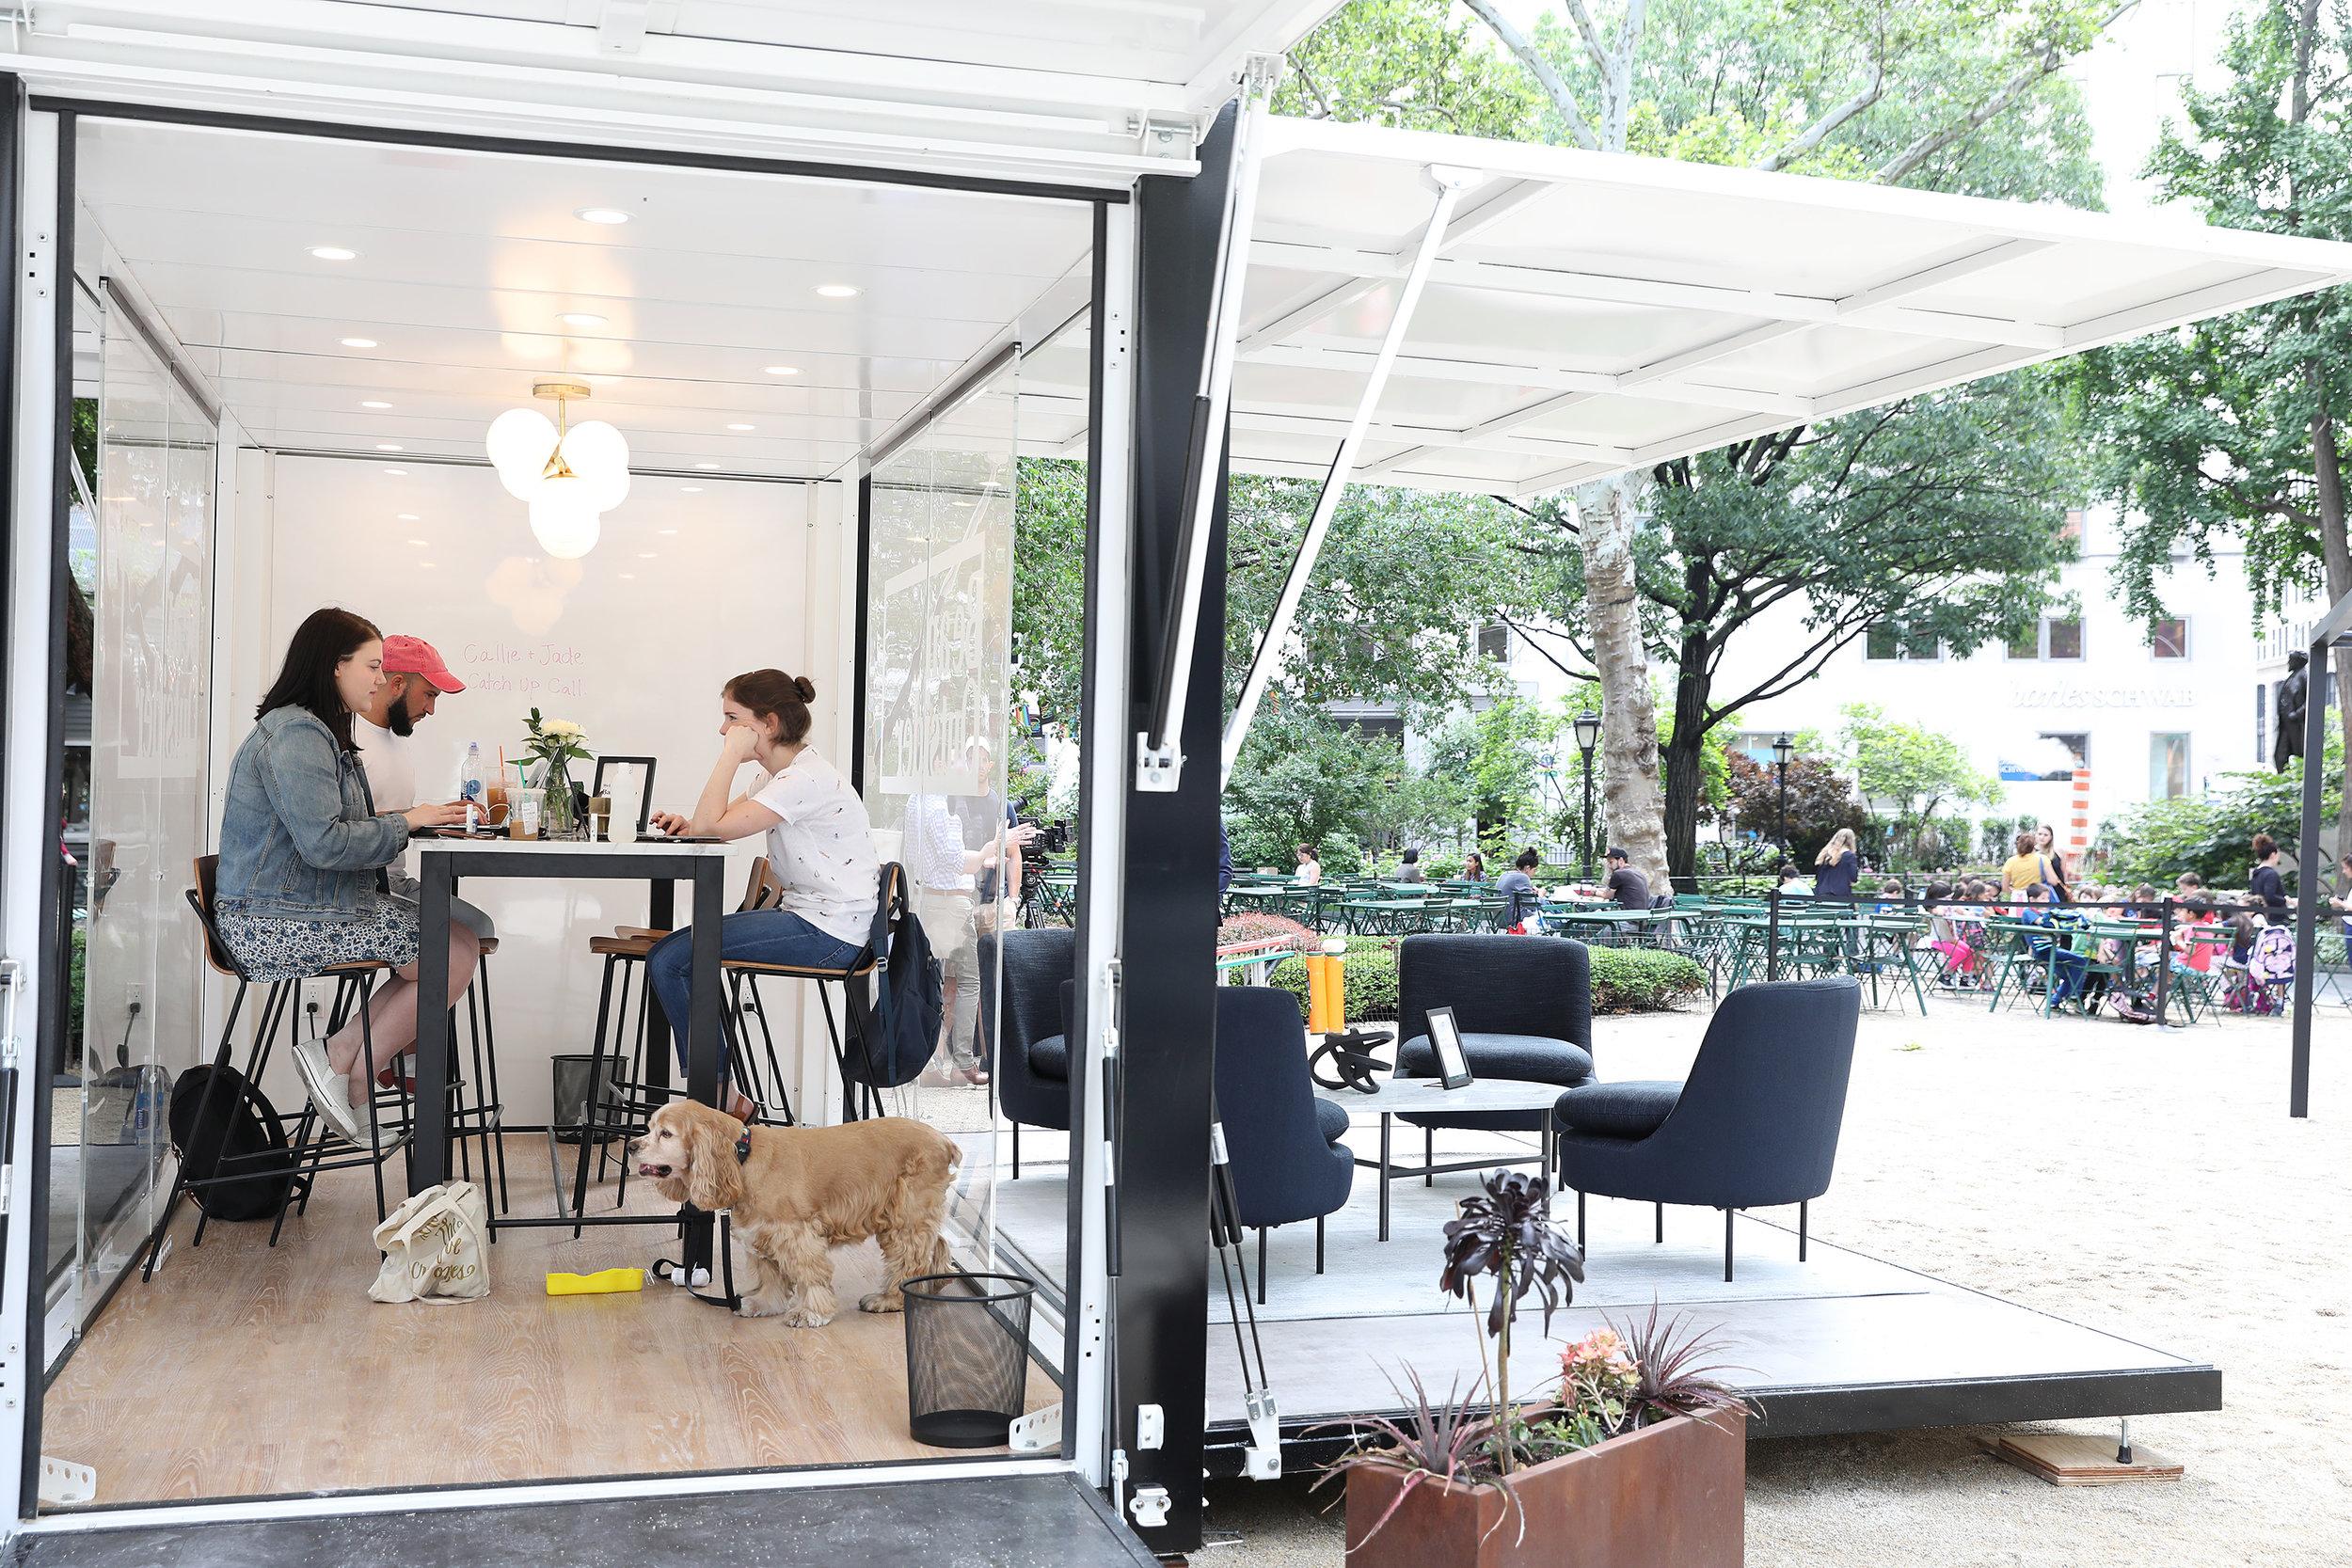 coworking-outdoors-nyc-popup.JPG